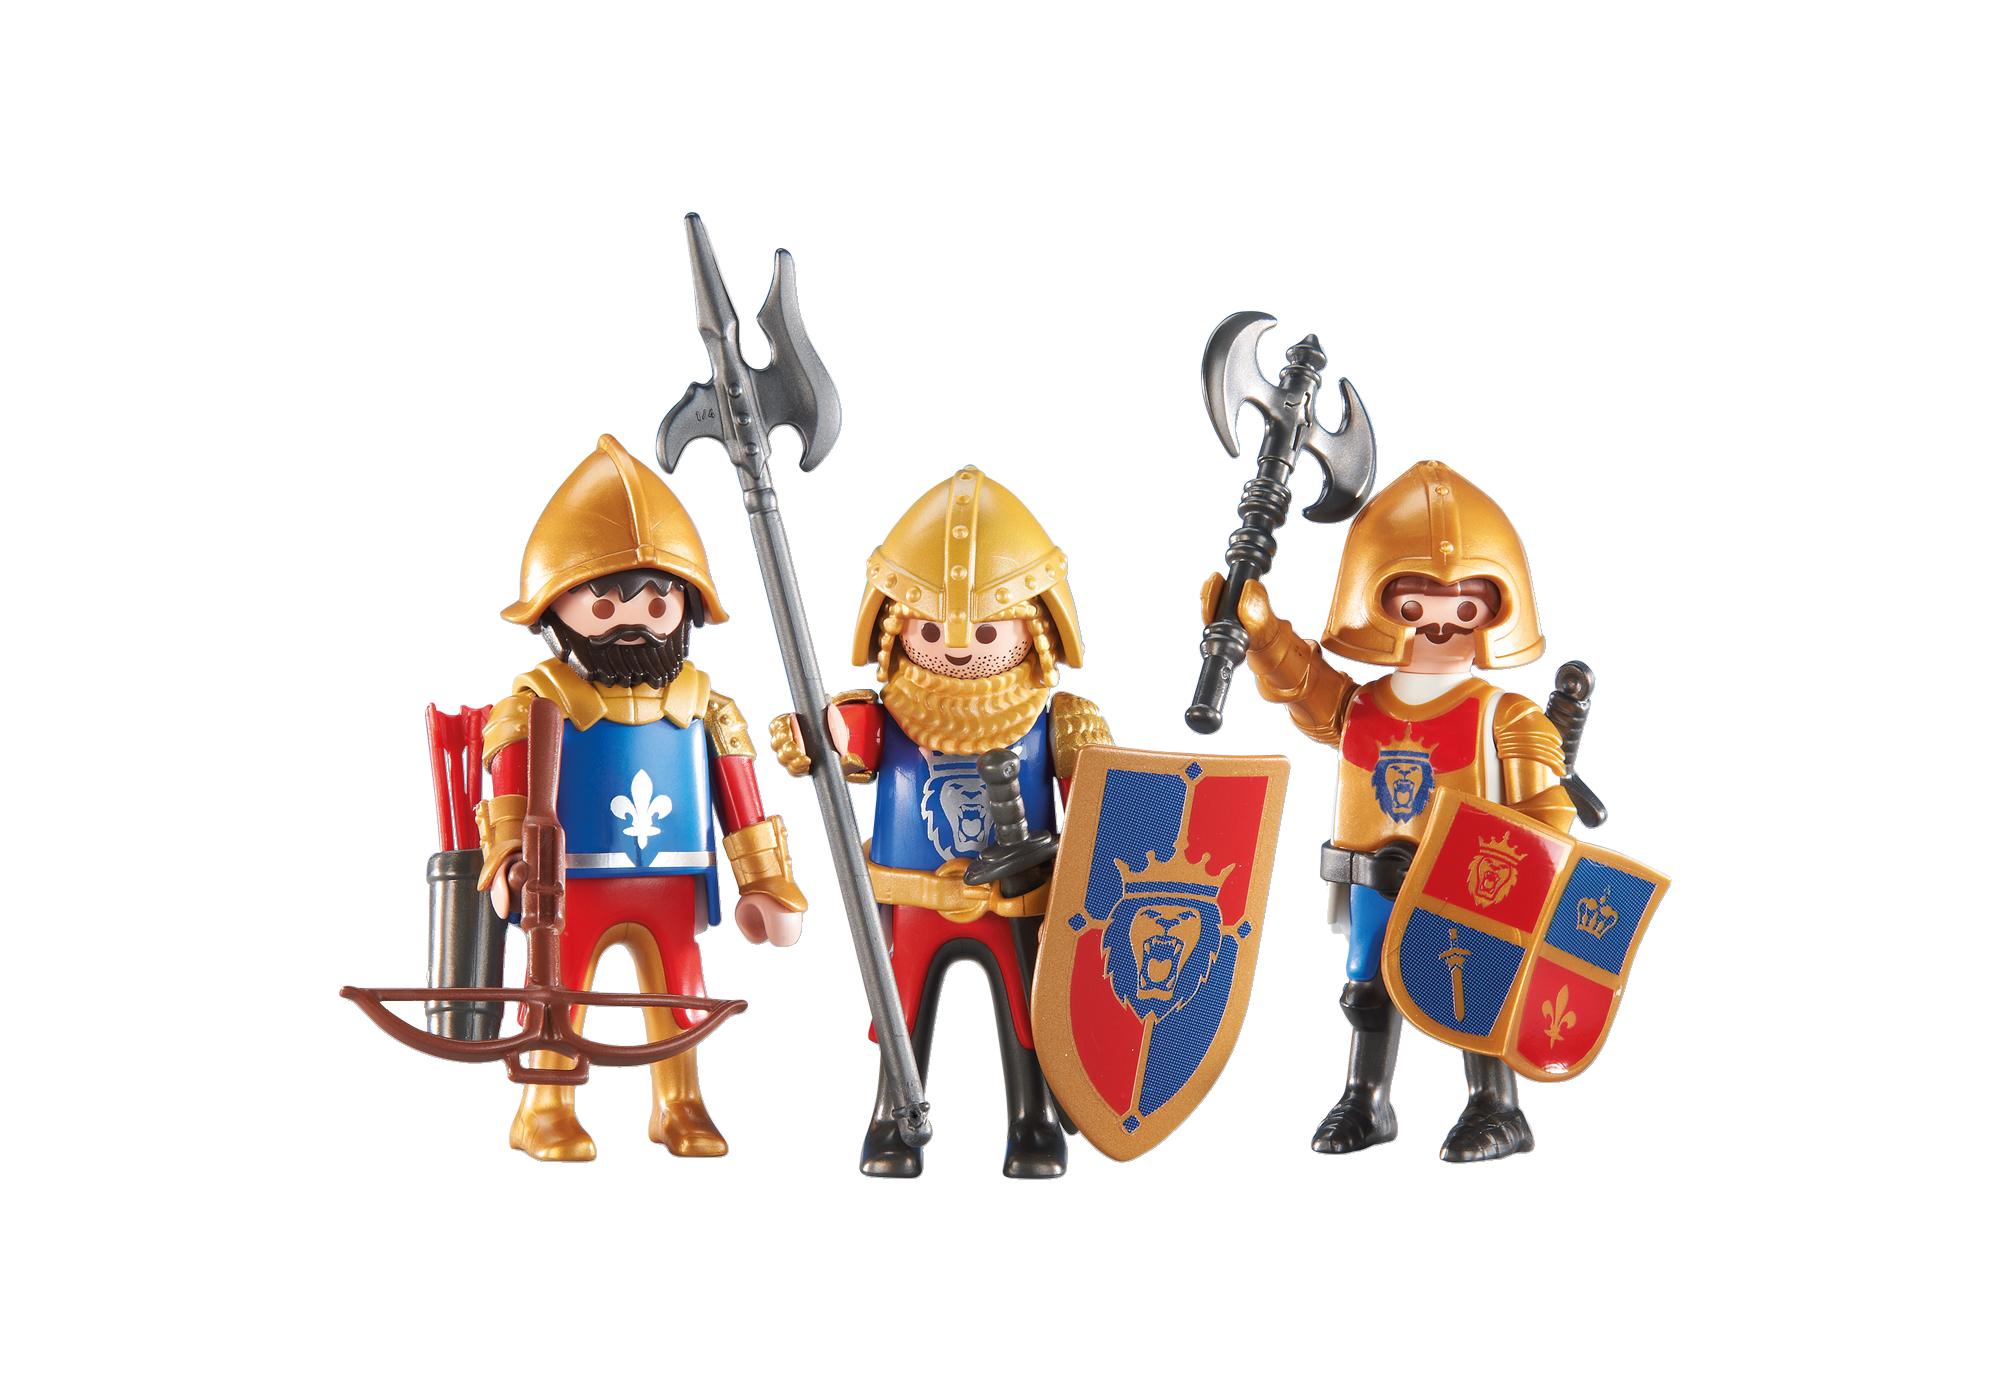 http://media.playmobil.com/i/playmobil/6379_product_detail/3 Lion knights